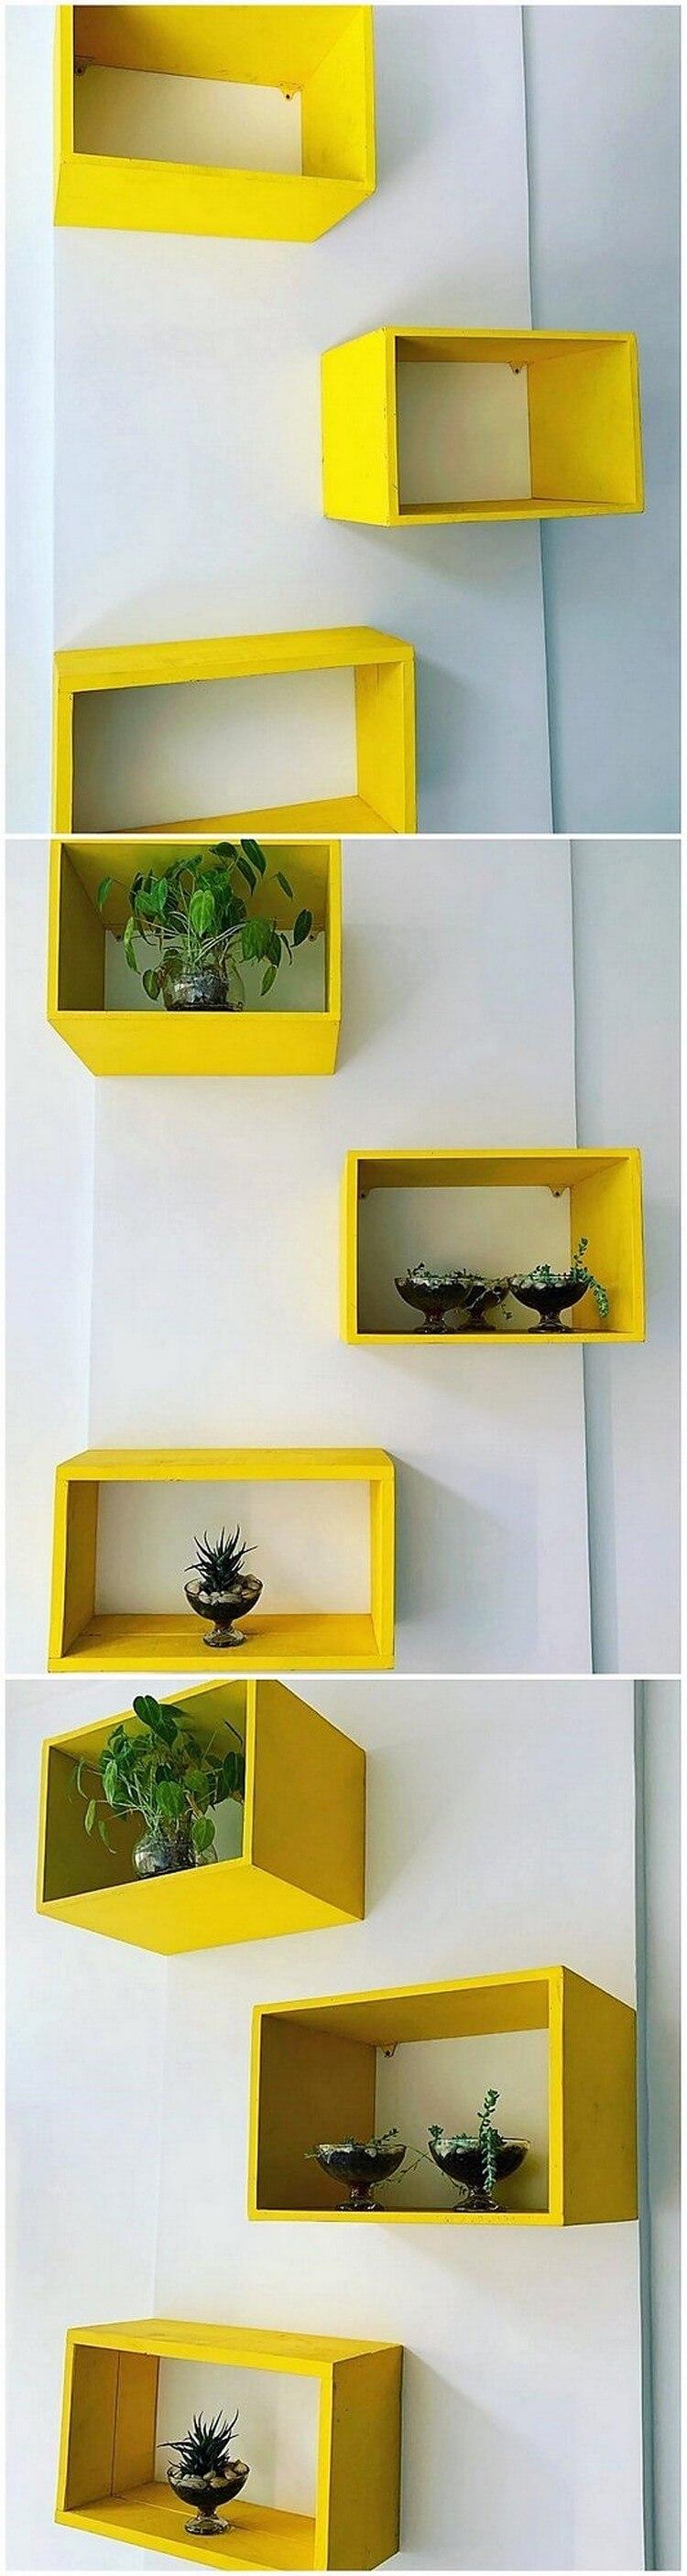 Pallet Wall Shelves